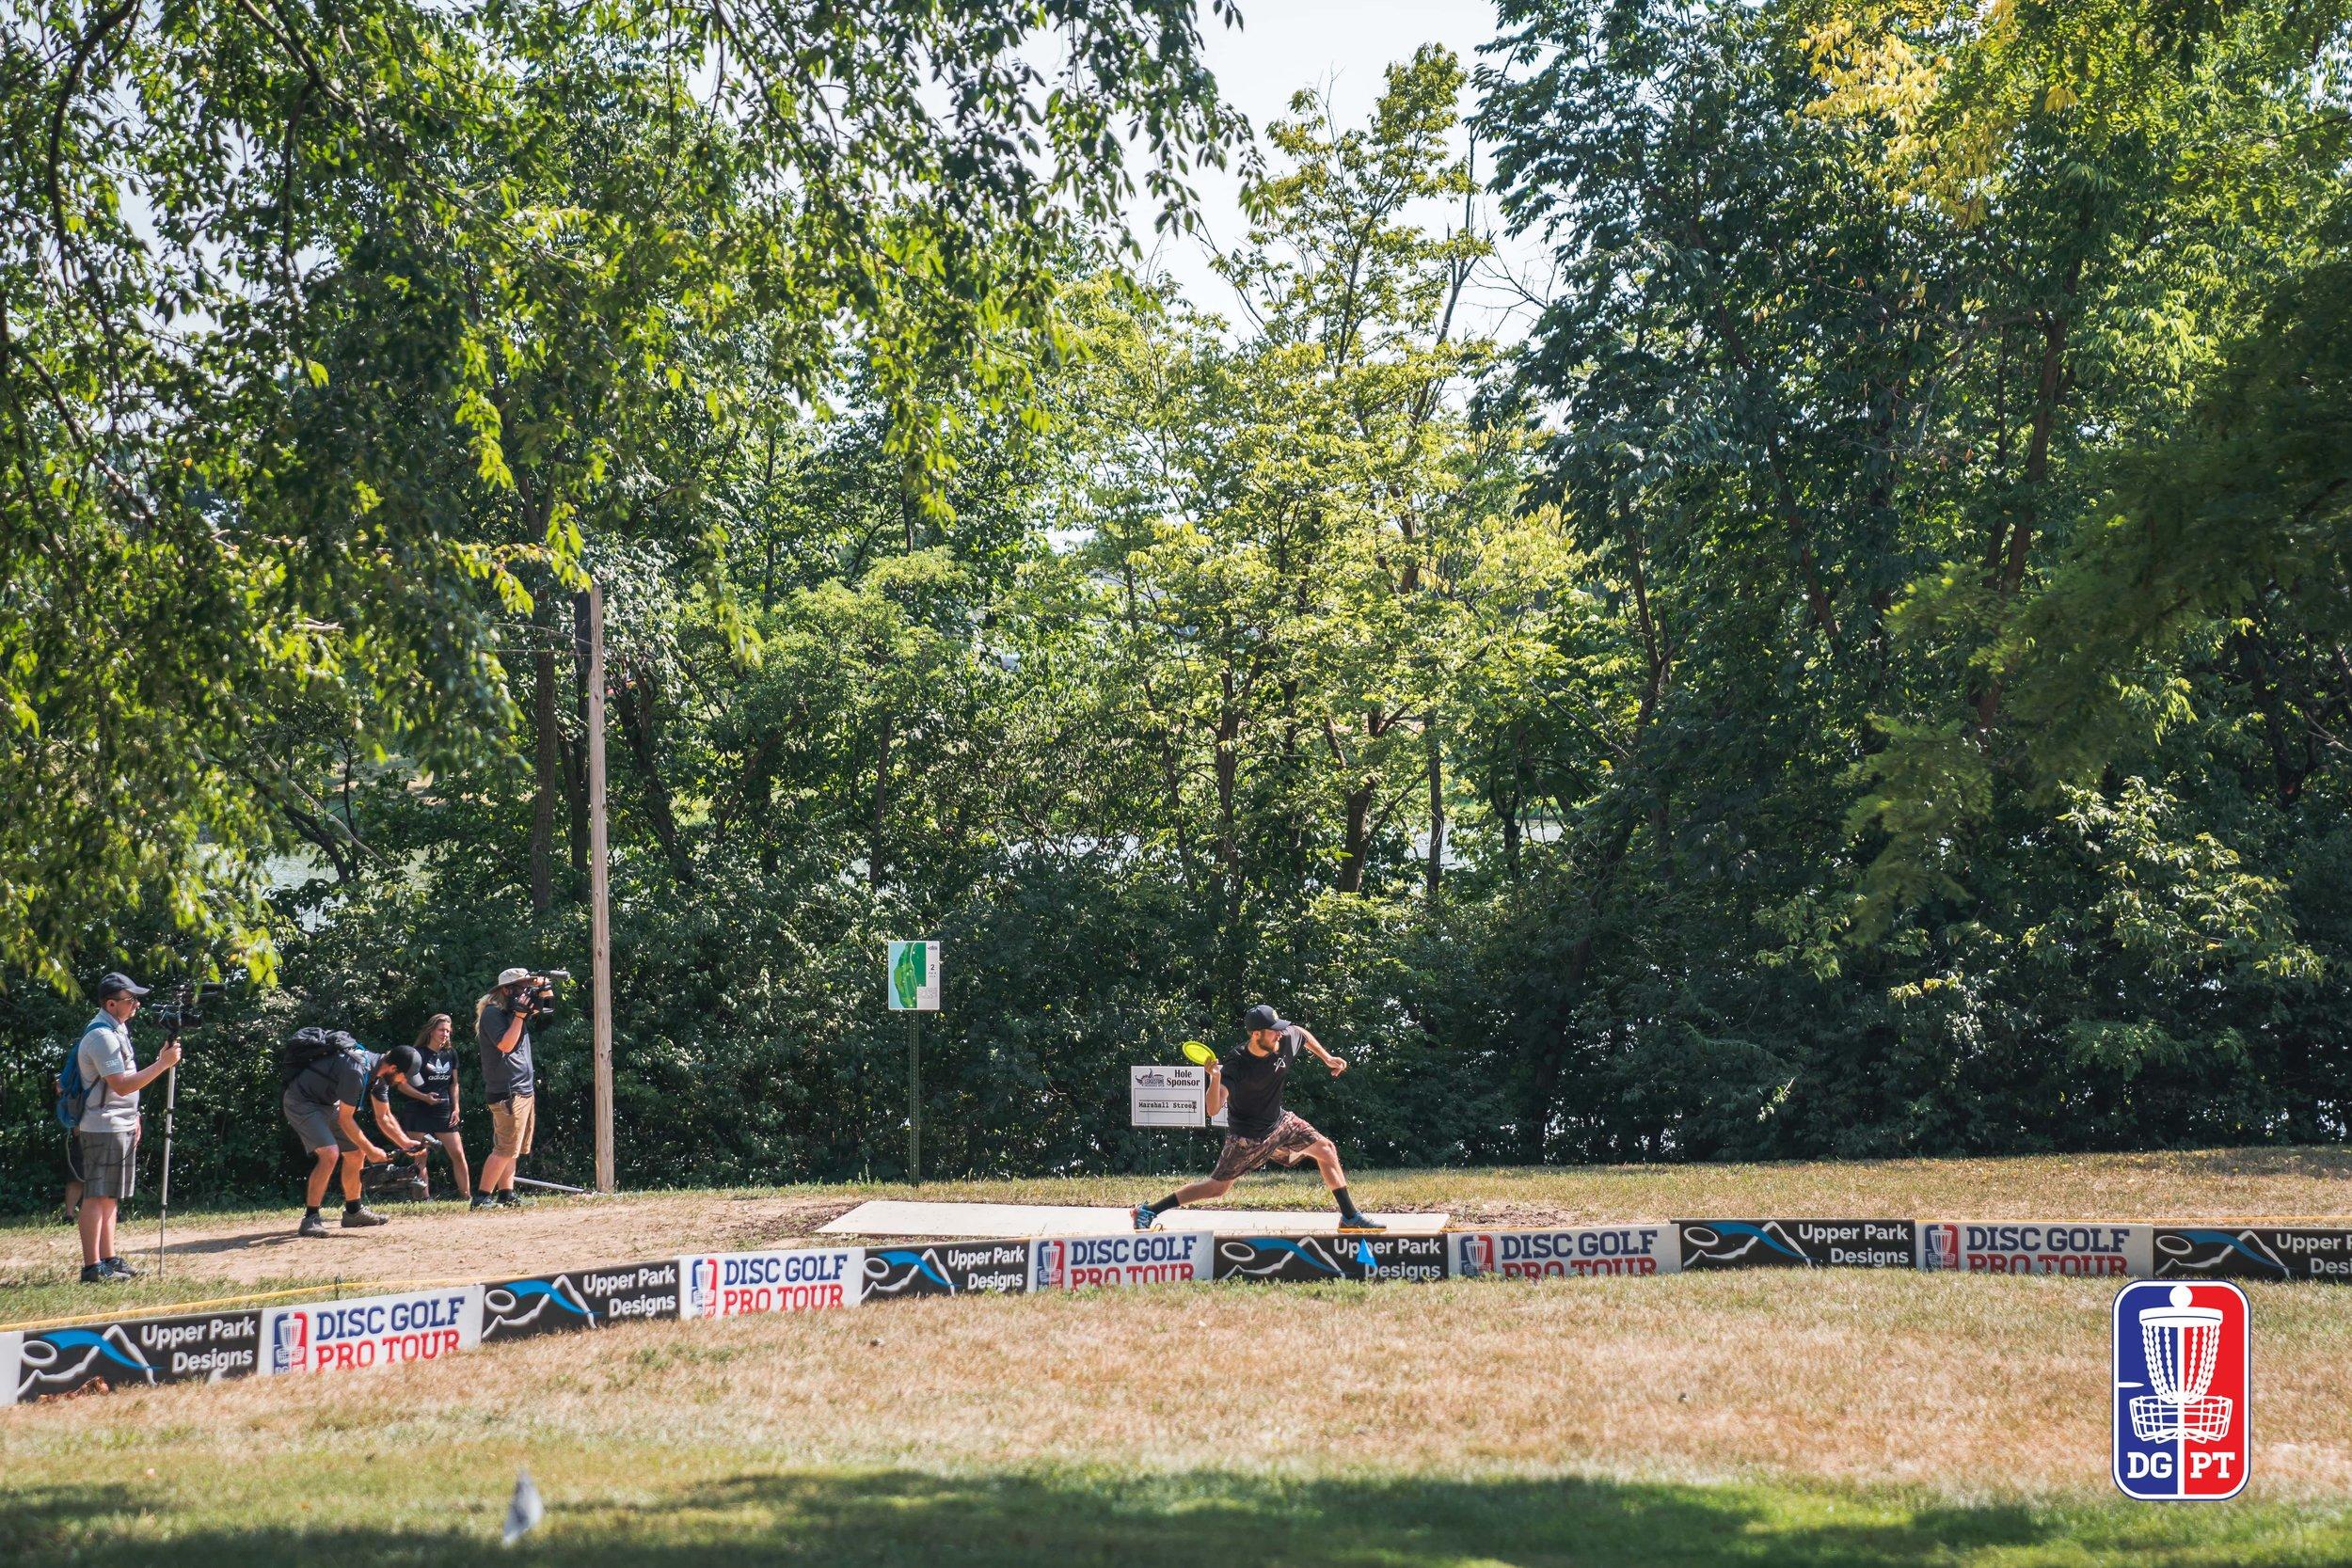 Chris Dickerson tee shot at Ledgestone Open (Photo: DGPT / Alyssa Van Lanen )